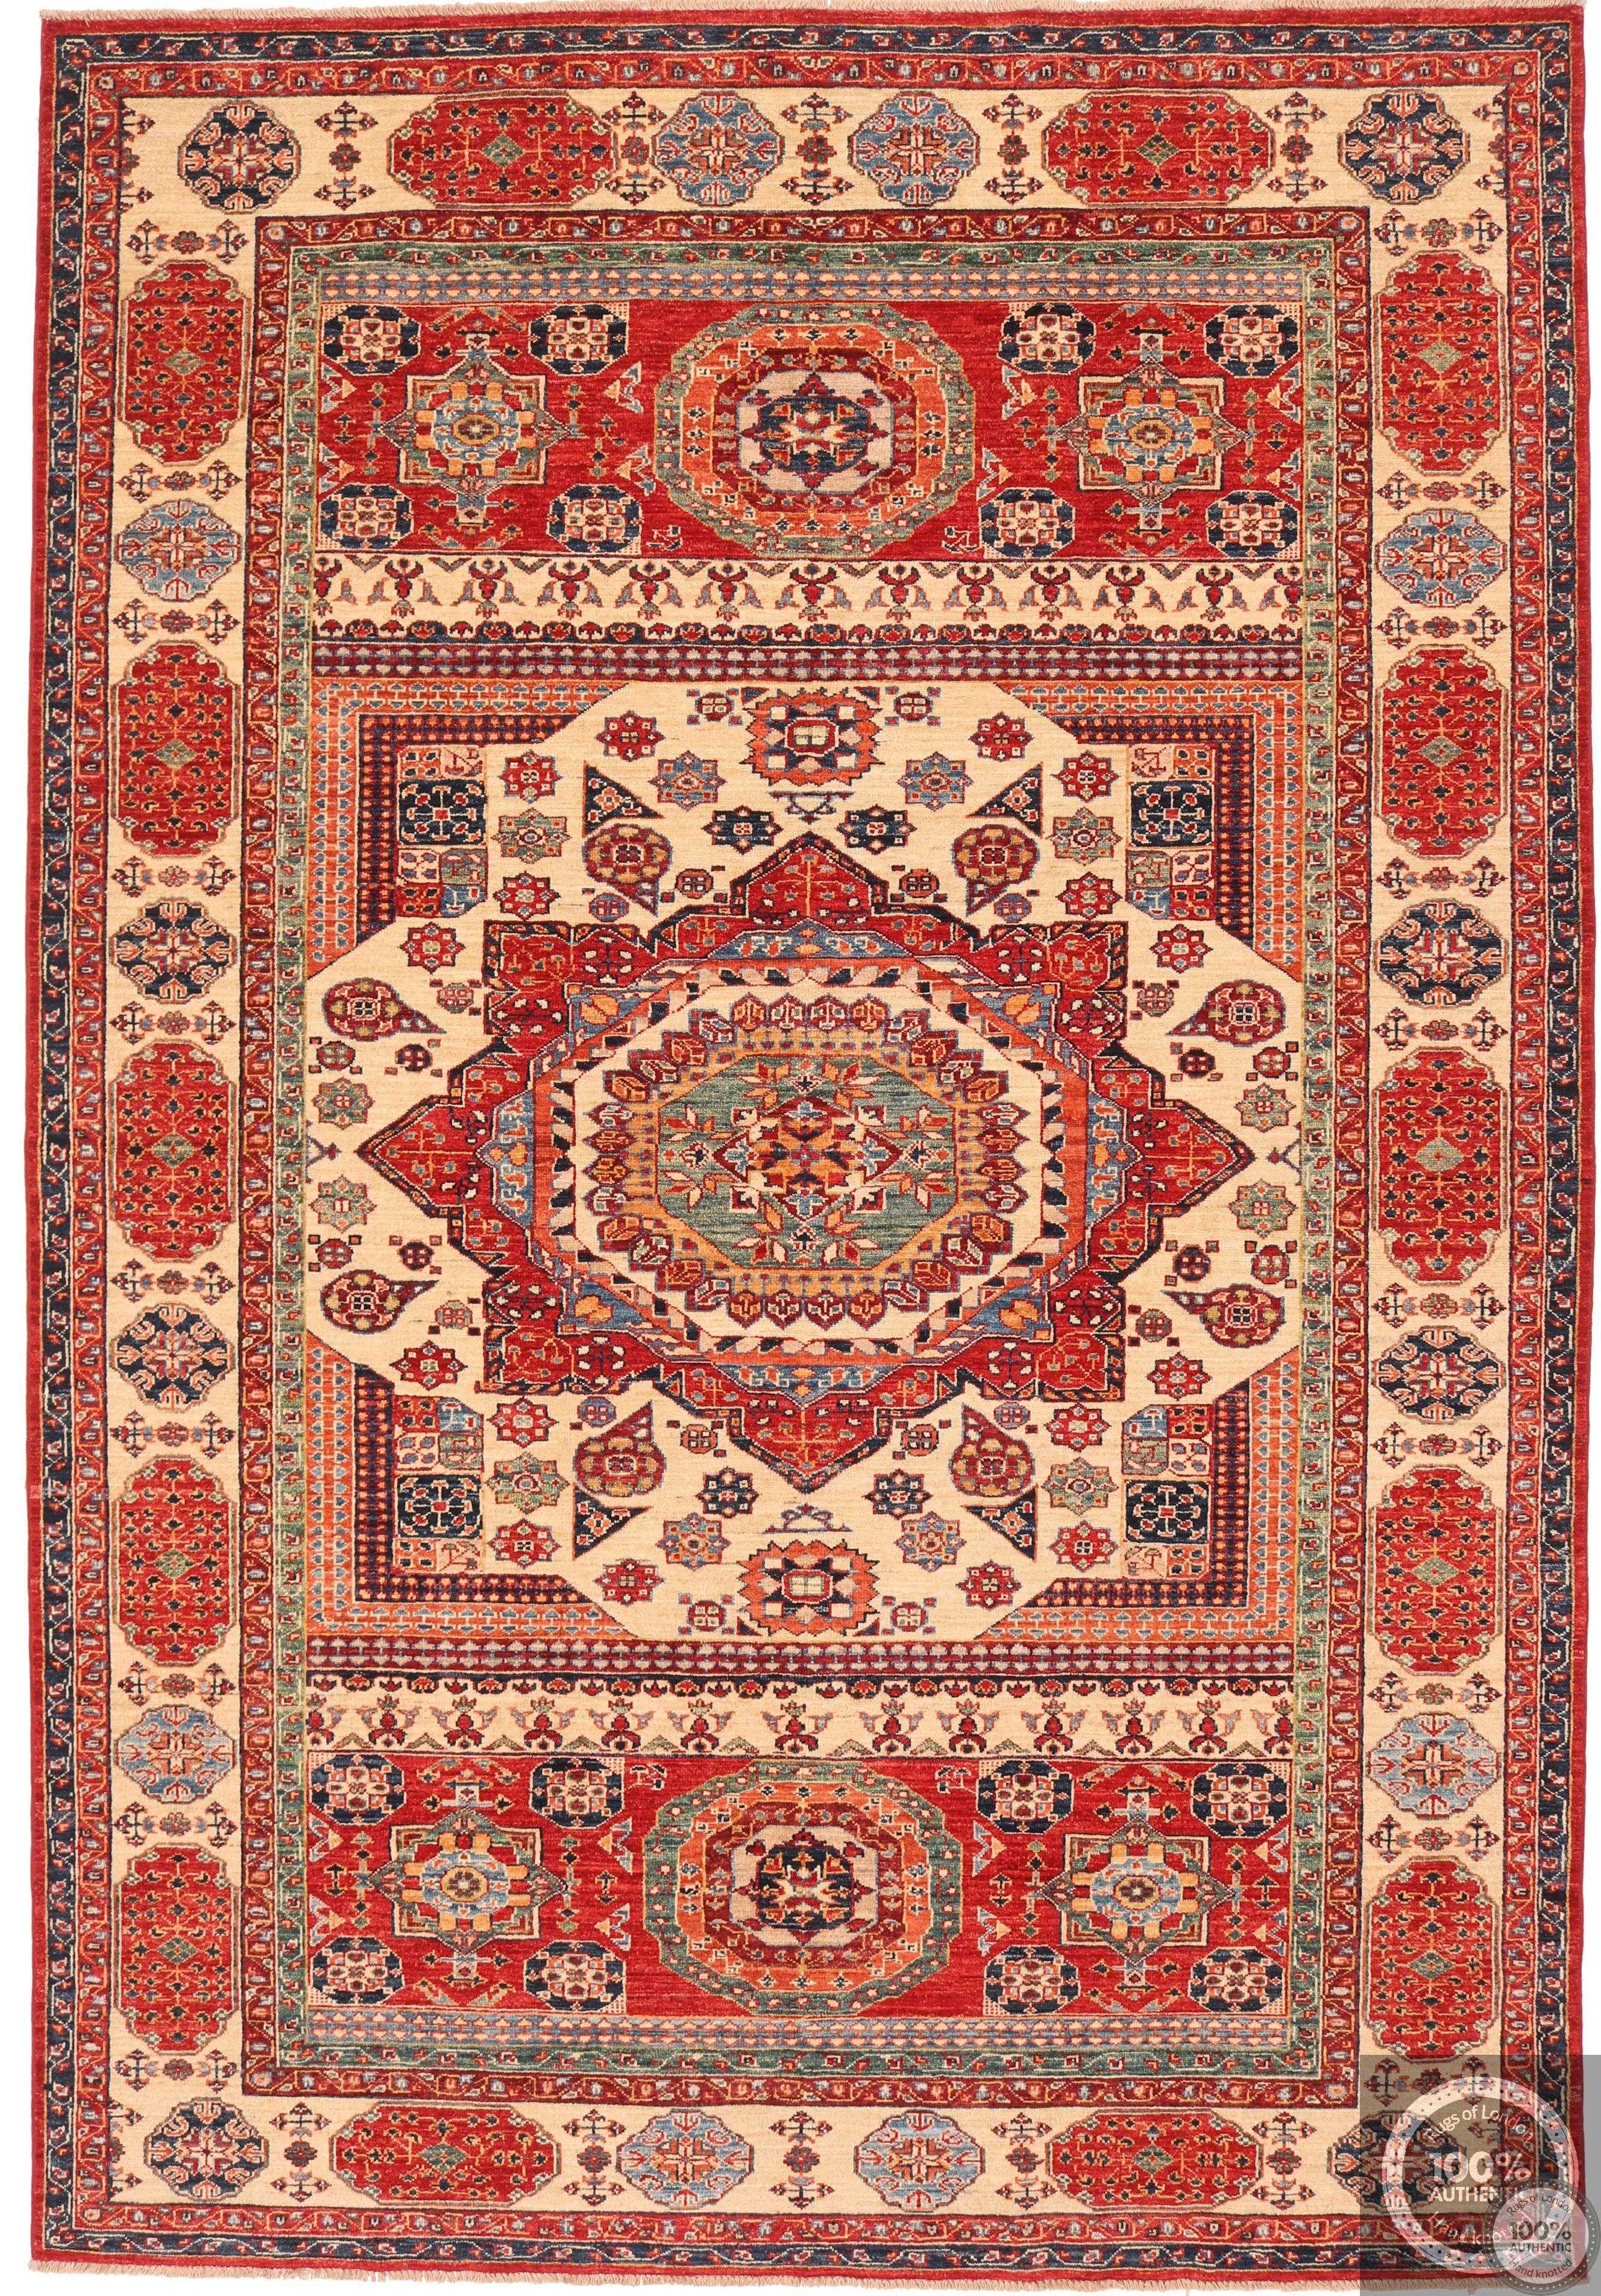 Garous Ziegler Mamluk design rug 9'7 x 6'6